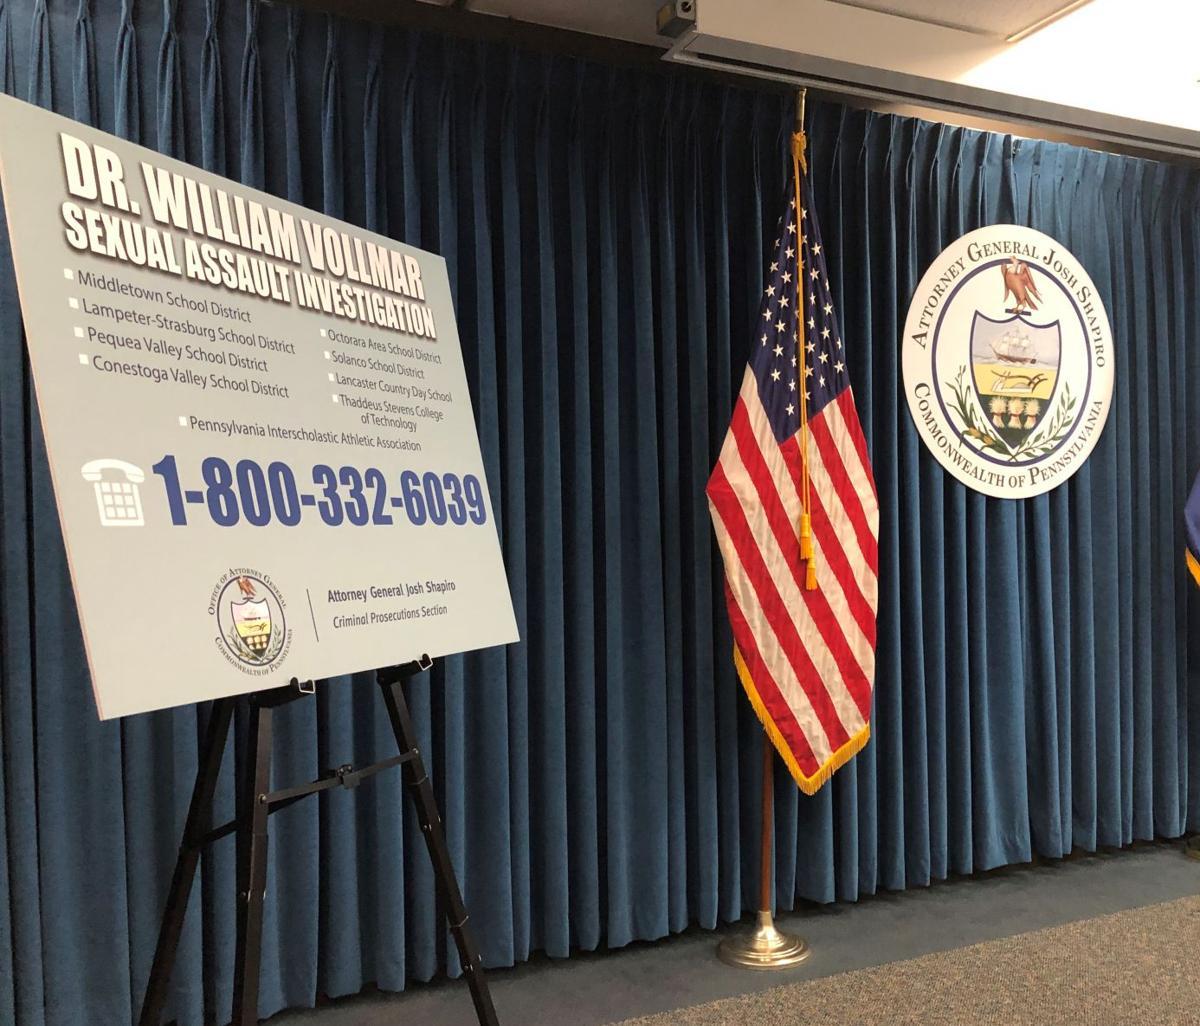 Attorney general hotline for Vollmar cases